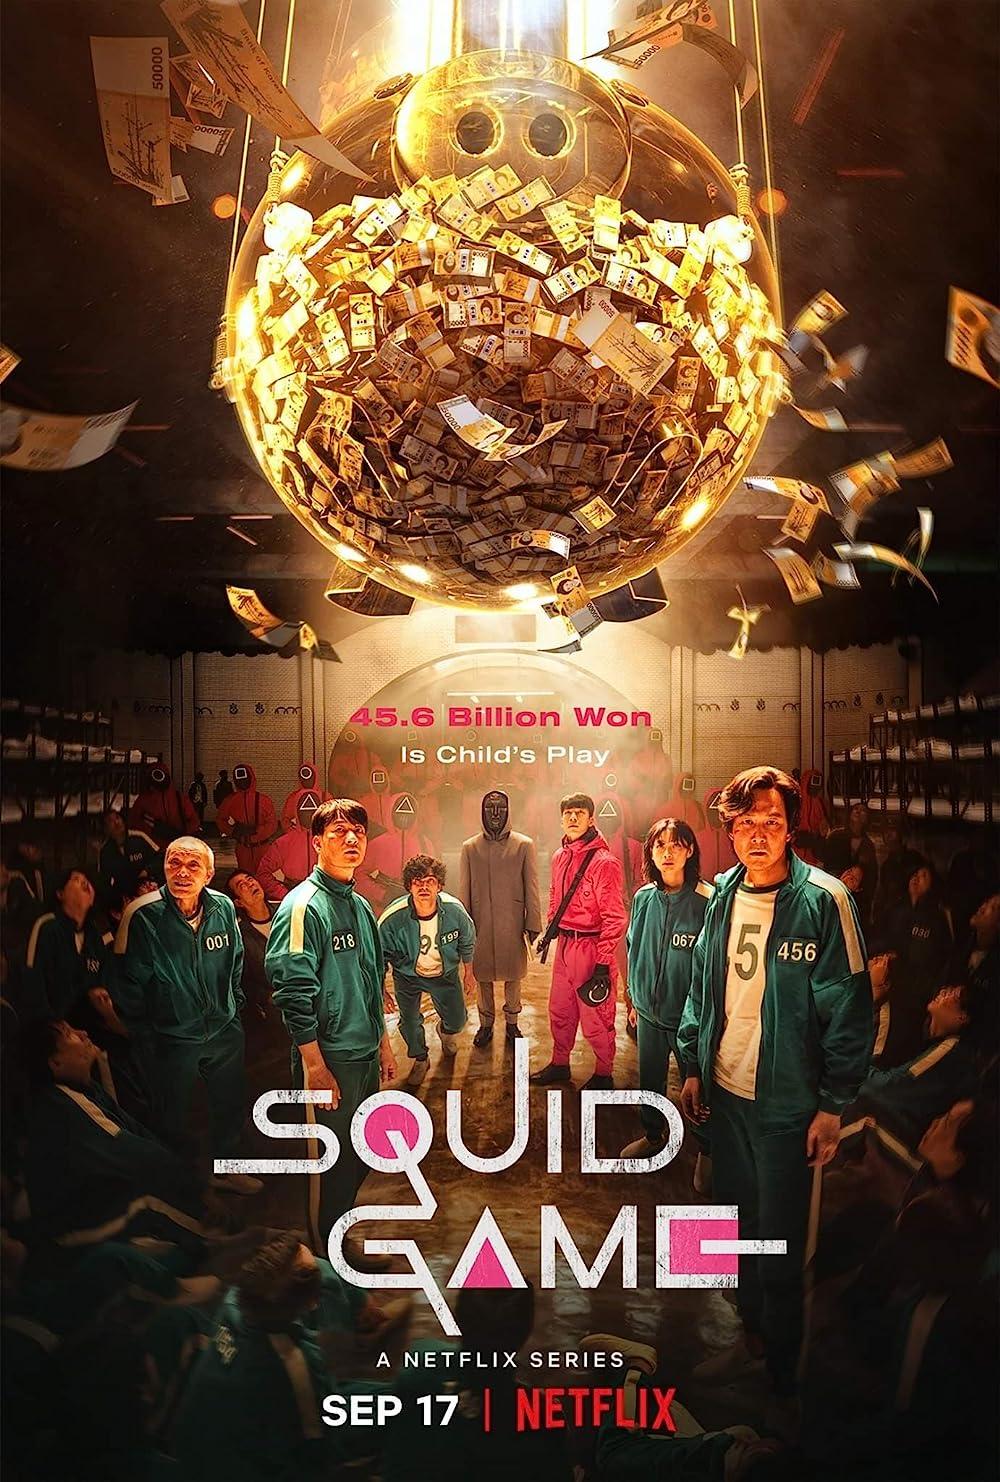 Squid Game 2021 S01 Hindi Dubbed NF Original Complete Web Series 720p | 480p HDRip 3.3GB Download